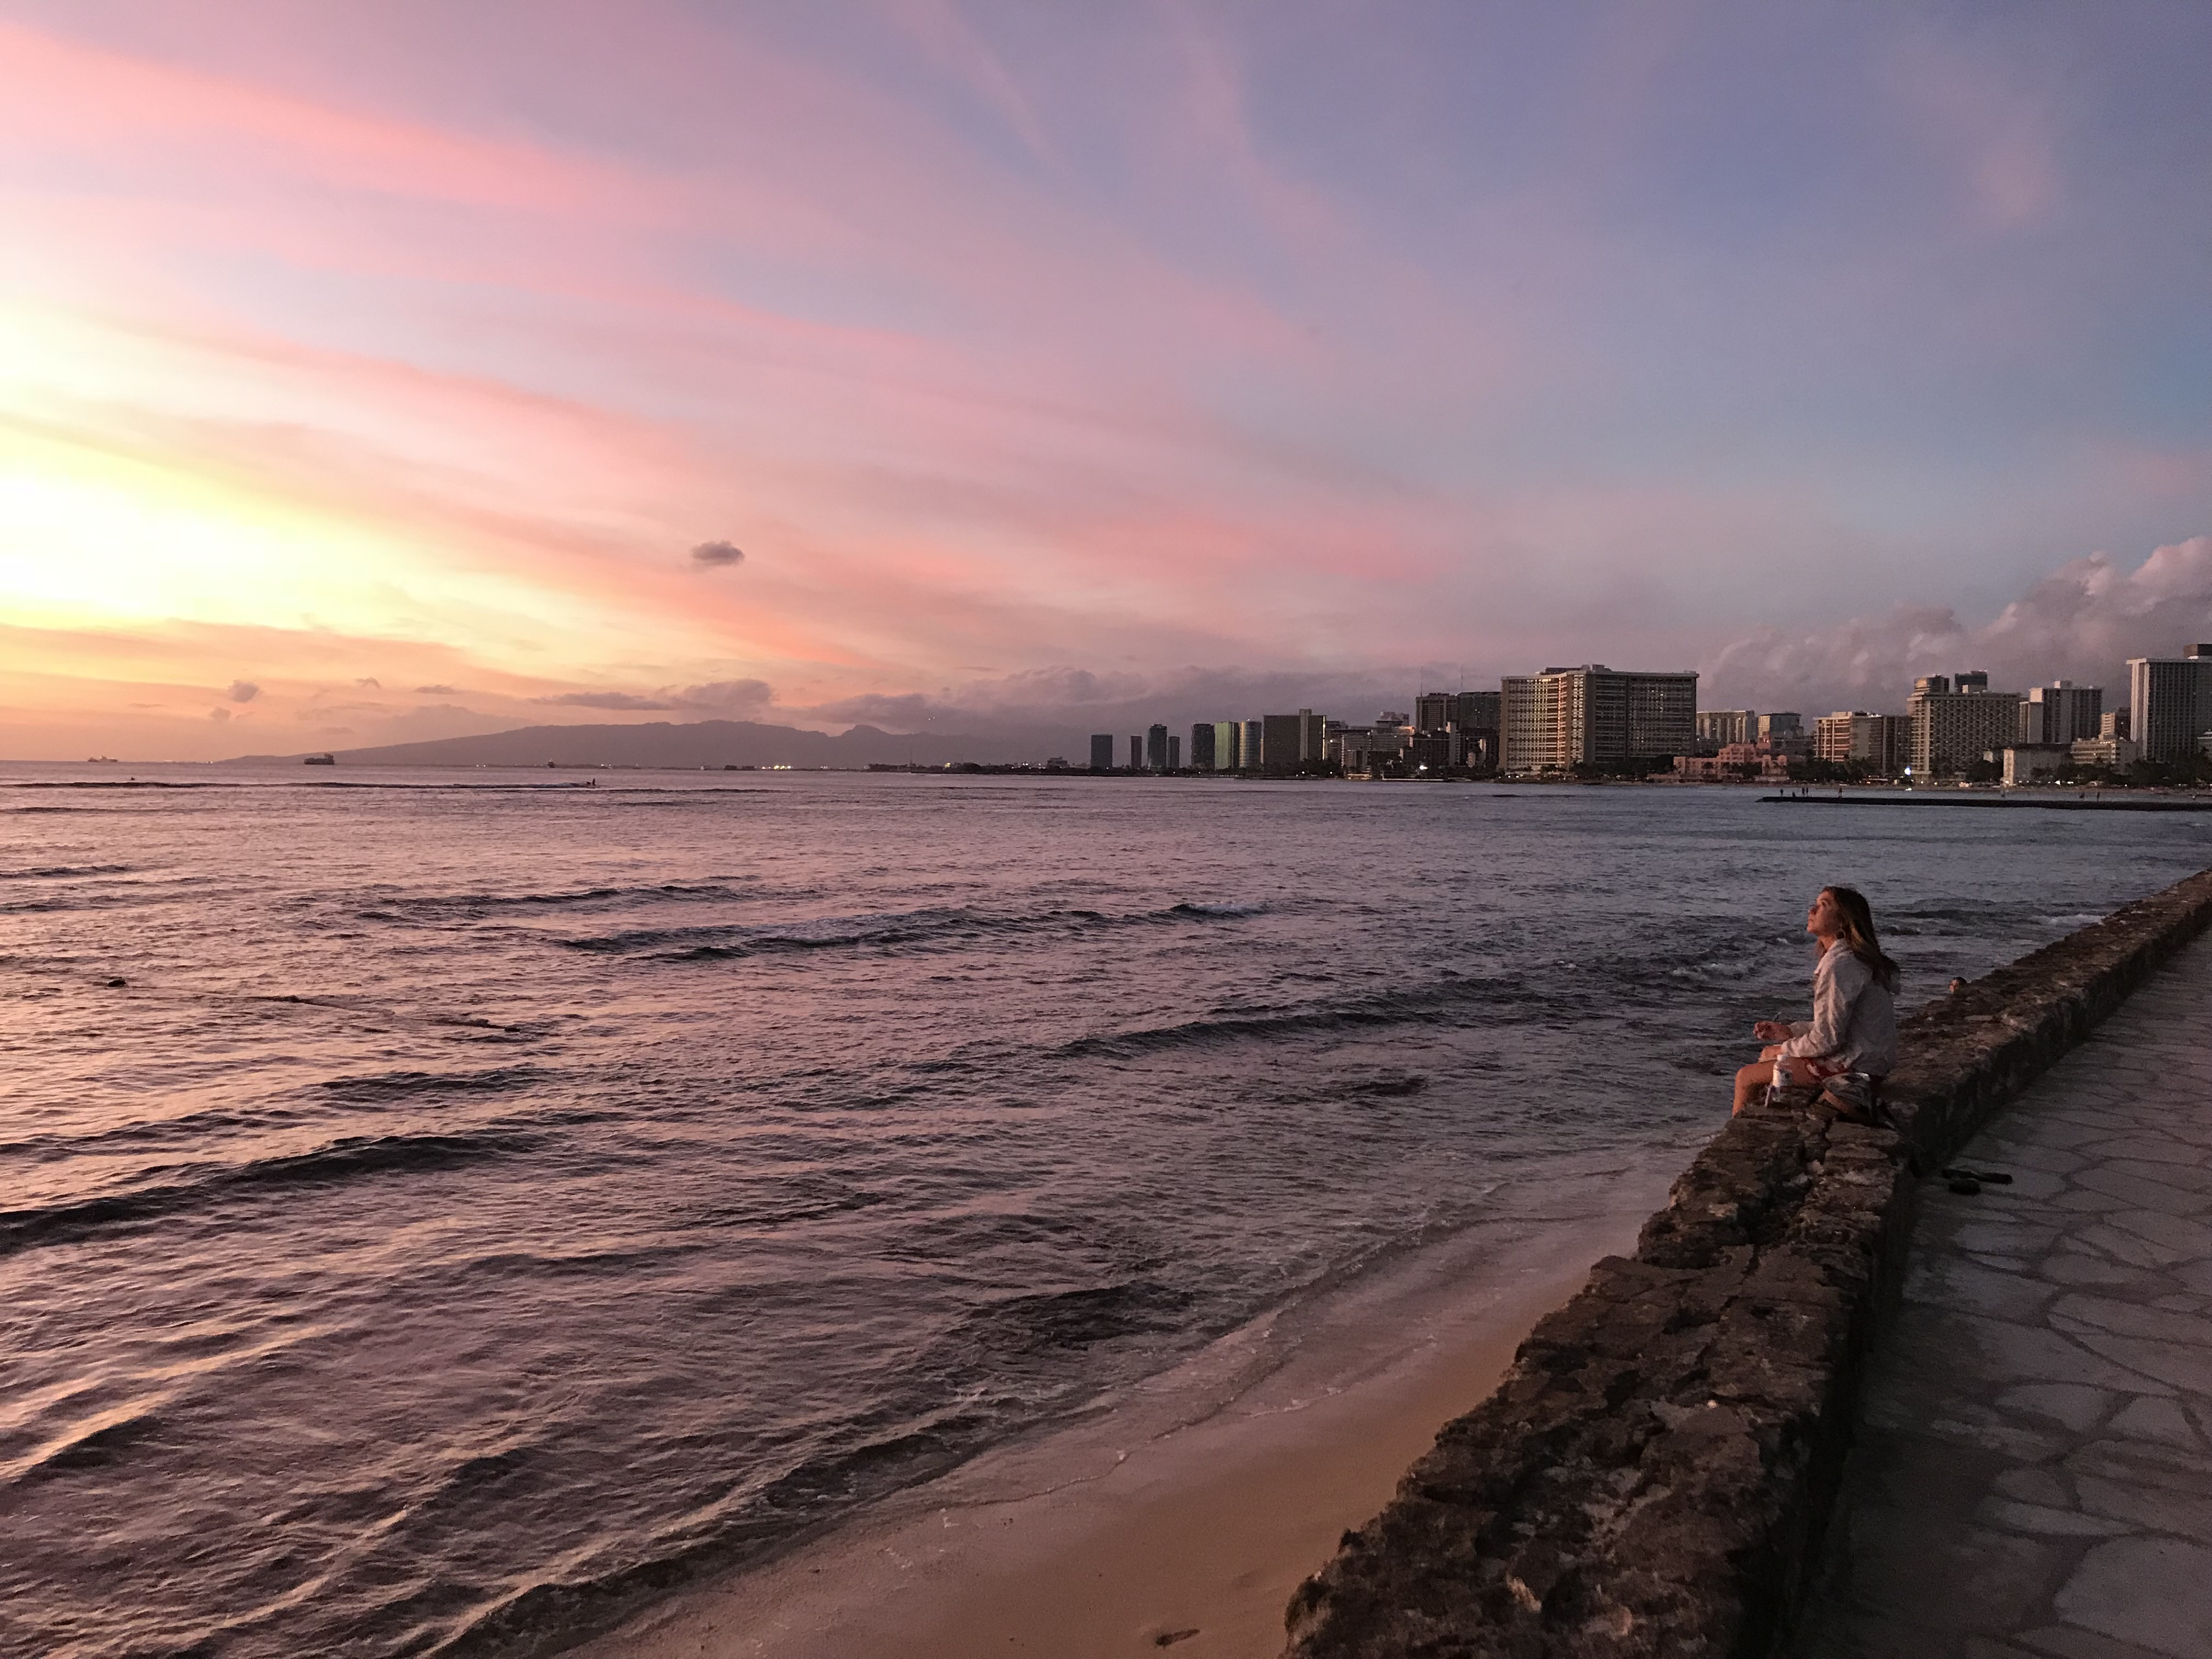 2018 11 12 315 Honolulu Waikiki.JPG